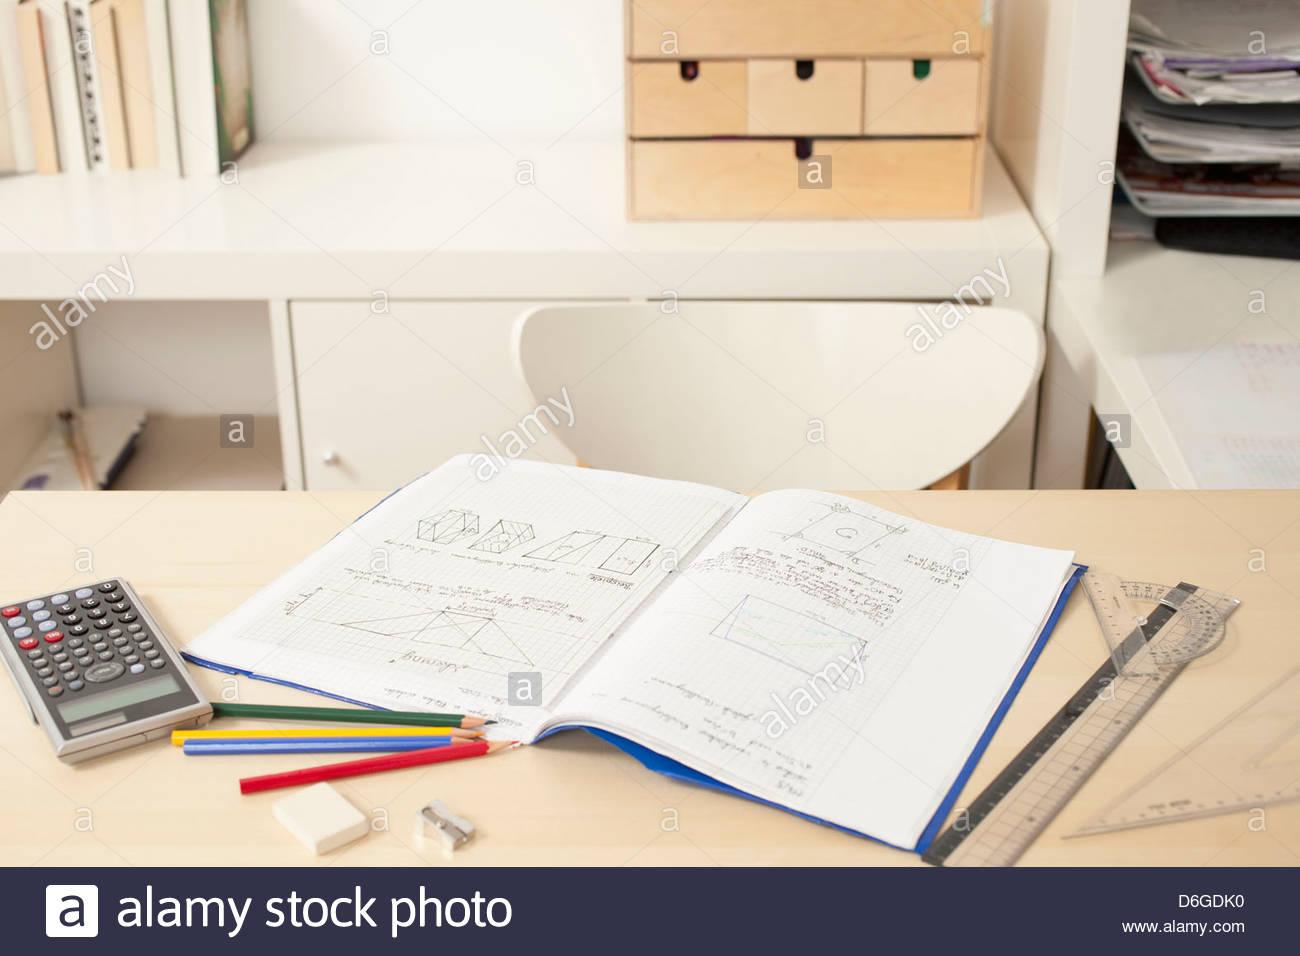 Homework still life - Stock Image